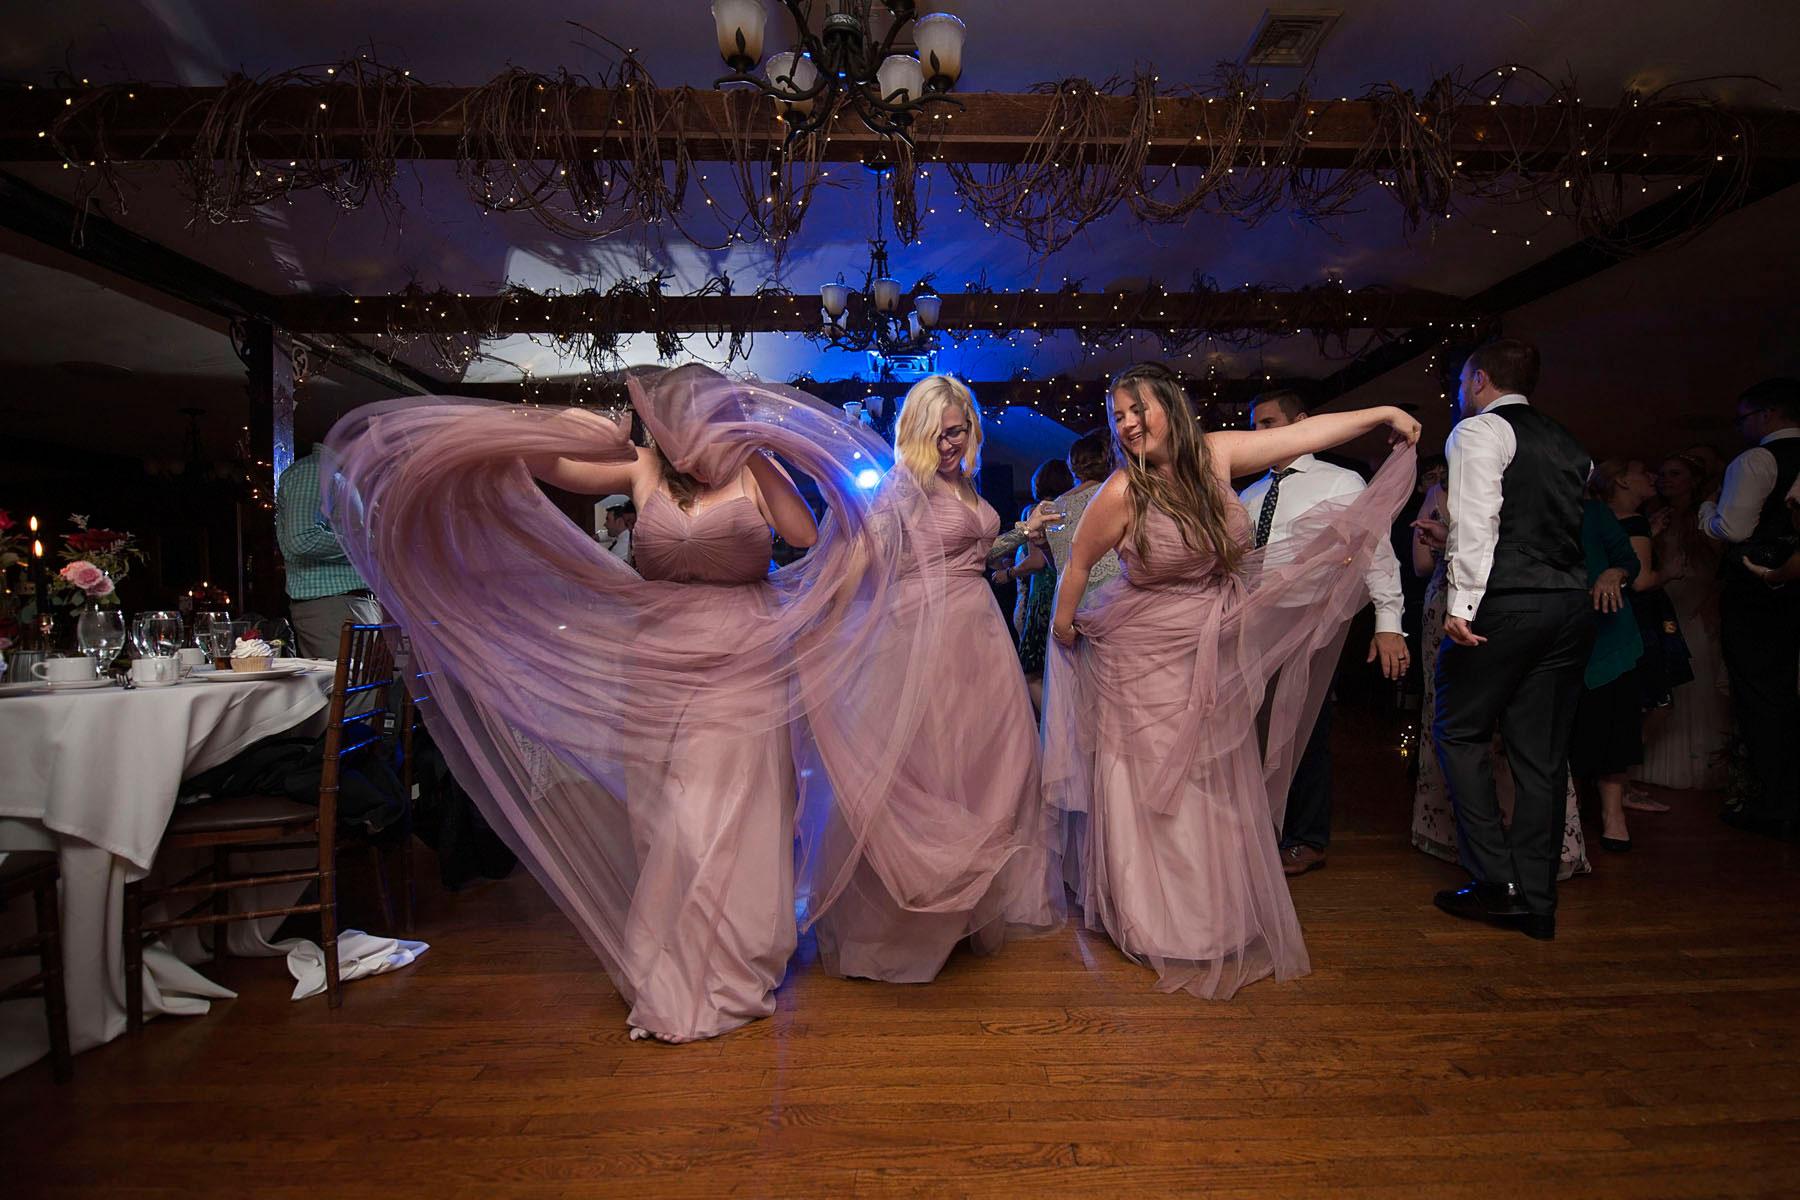 Bucks_County_wedding_photographer_Stroudsmoor_country_inn_wedding_Philadelphia_wedding_photographer_30_twirling_bridesmaids.JPG